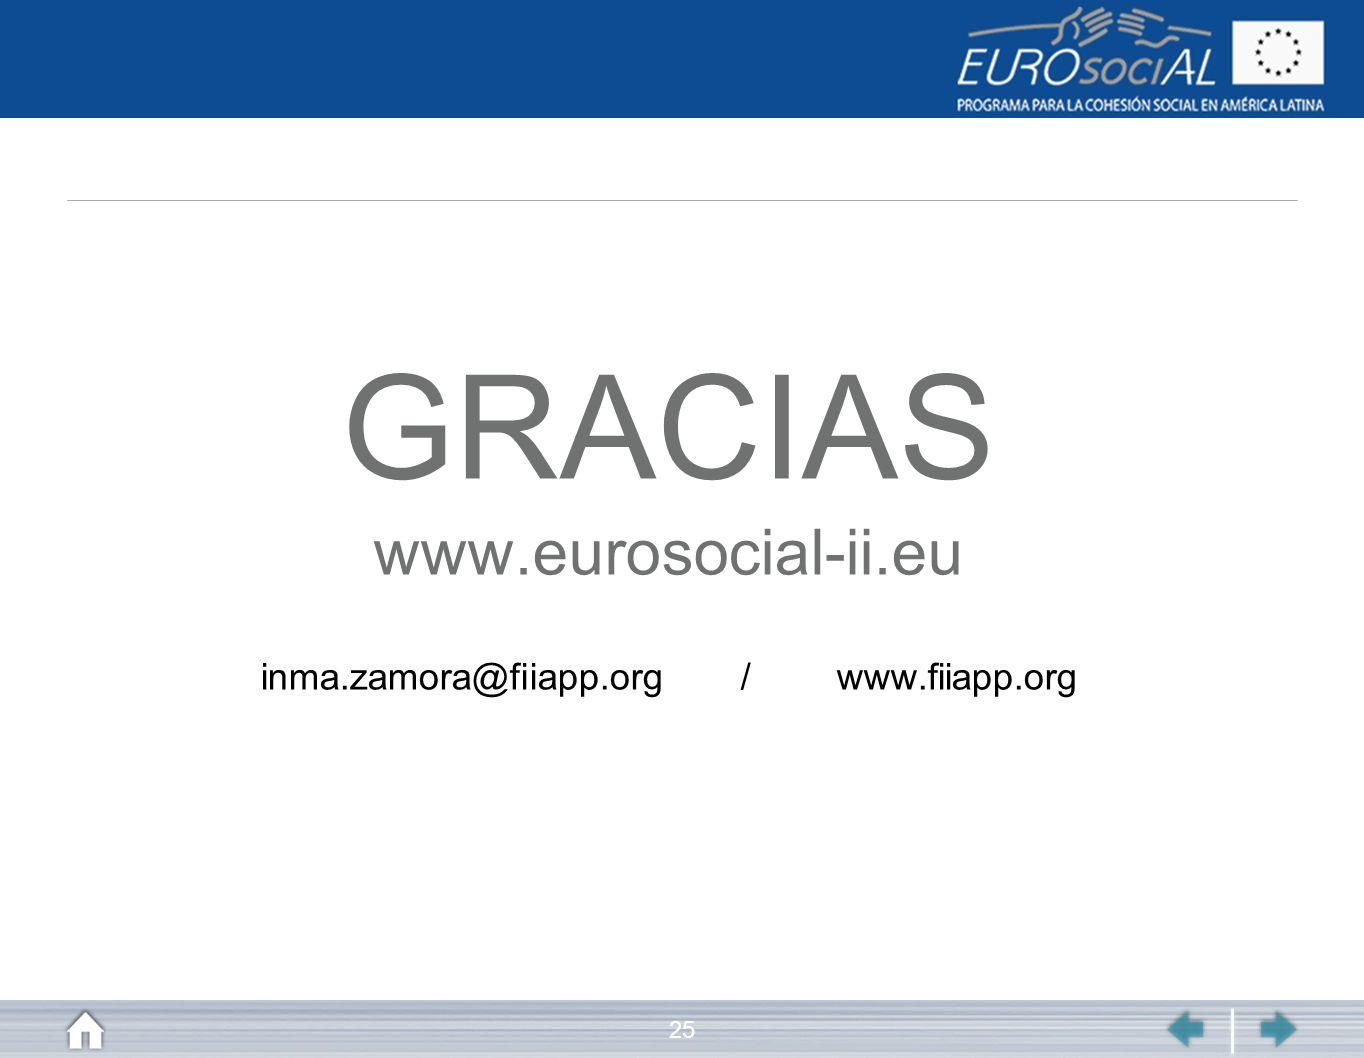 GRACIAS www.eurosocial-ii.eu inma.zamora@fiiapp.org / www.fiiapp.org